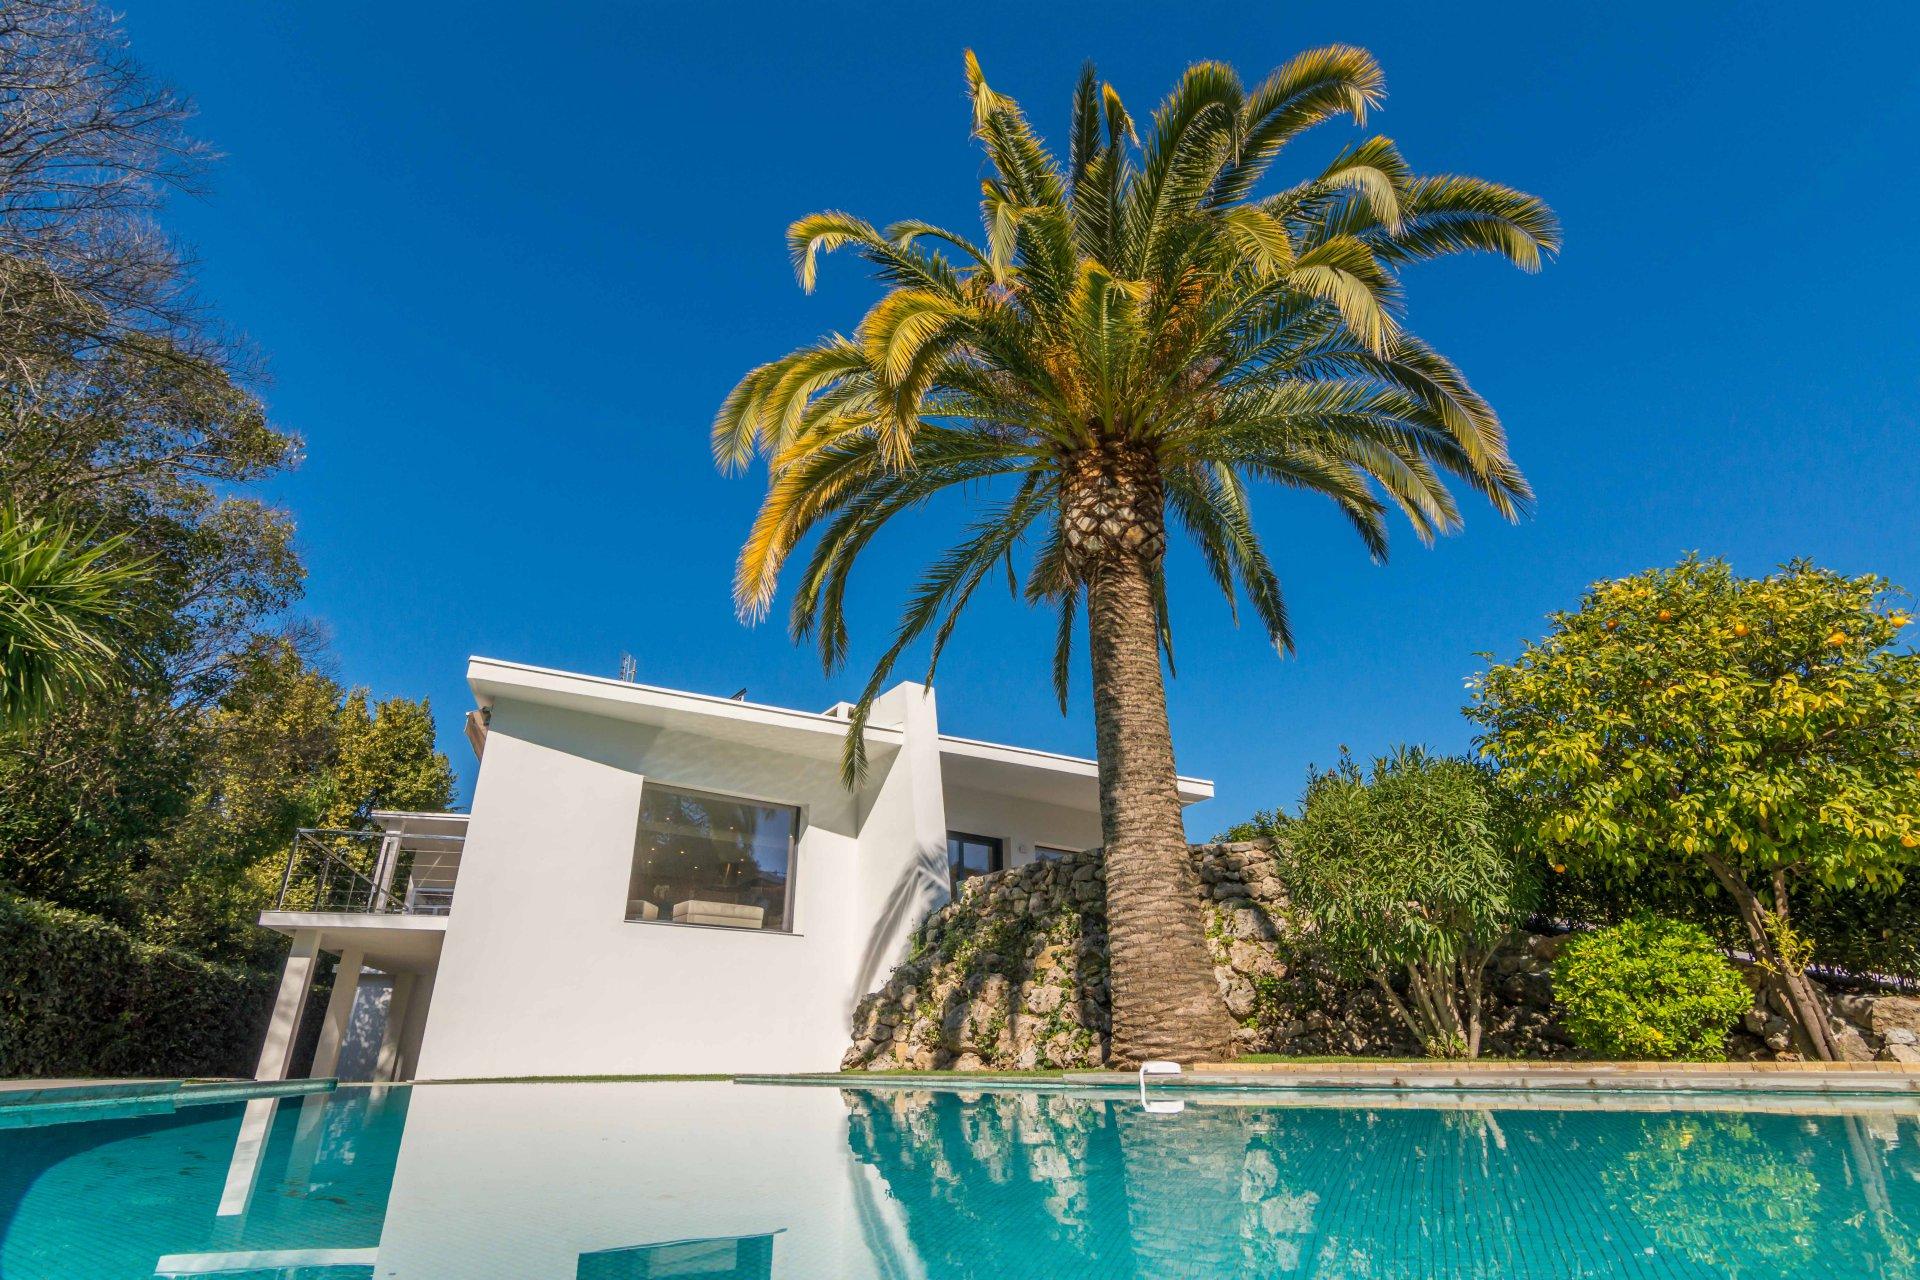 Rental Villa 4 bedroom few minutes walking to Cannes